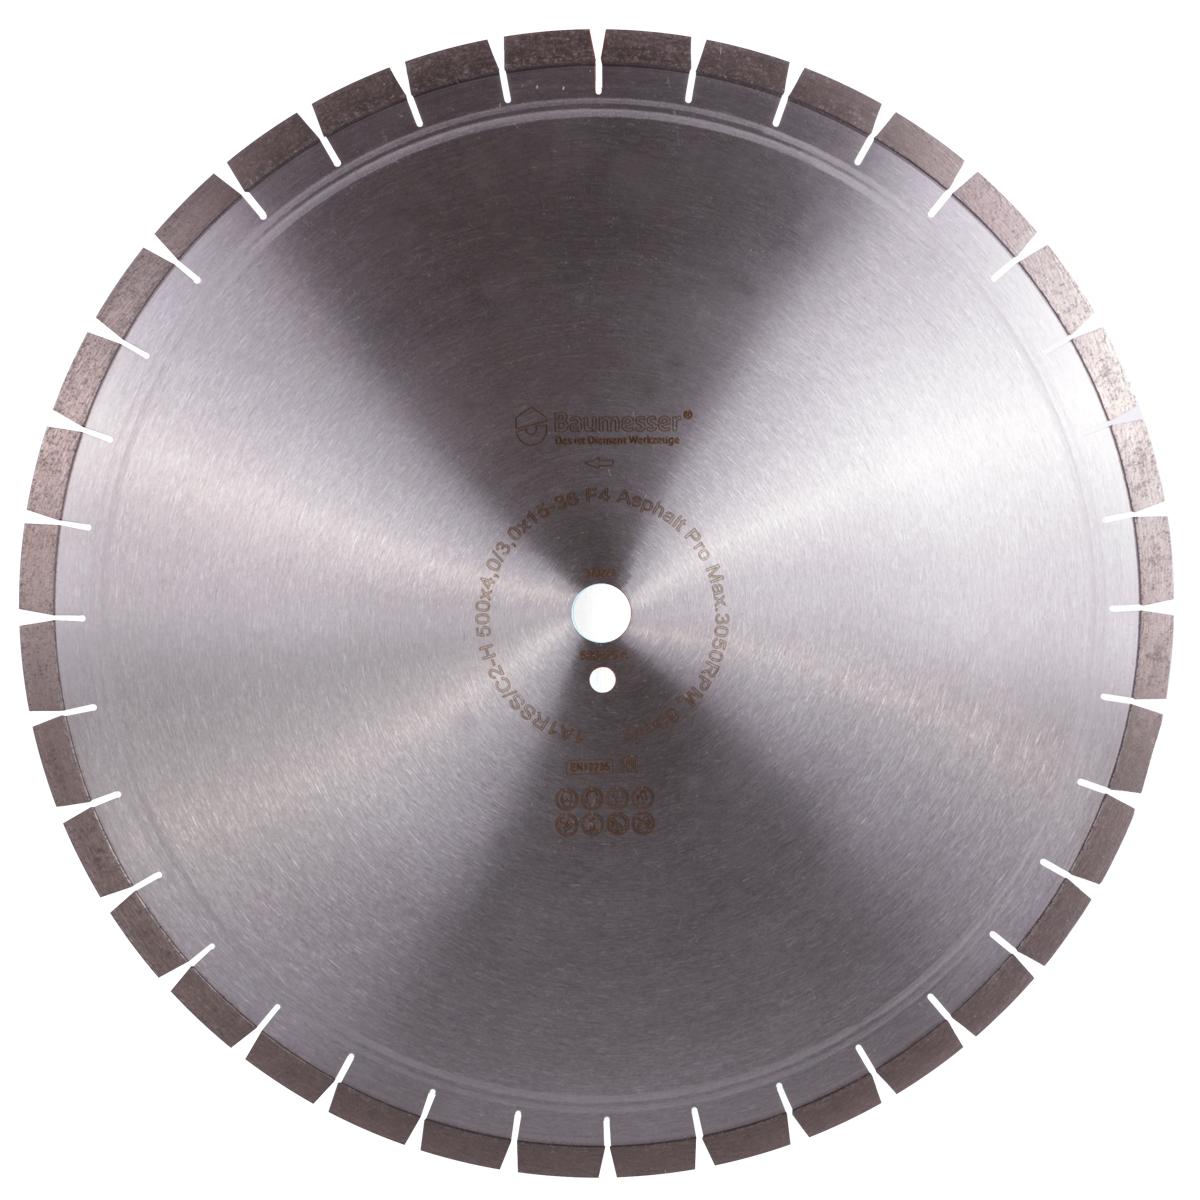 Круг алмазный отрезной 1A1RSS/C2-H 500x4,0/3,0x15x25,4-36 F4 Baumesser Asphalt Pro